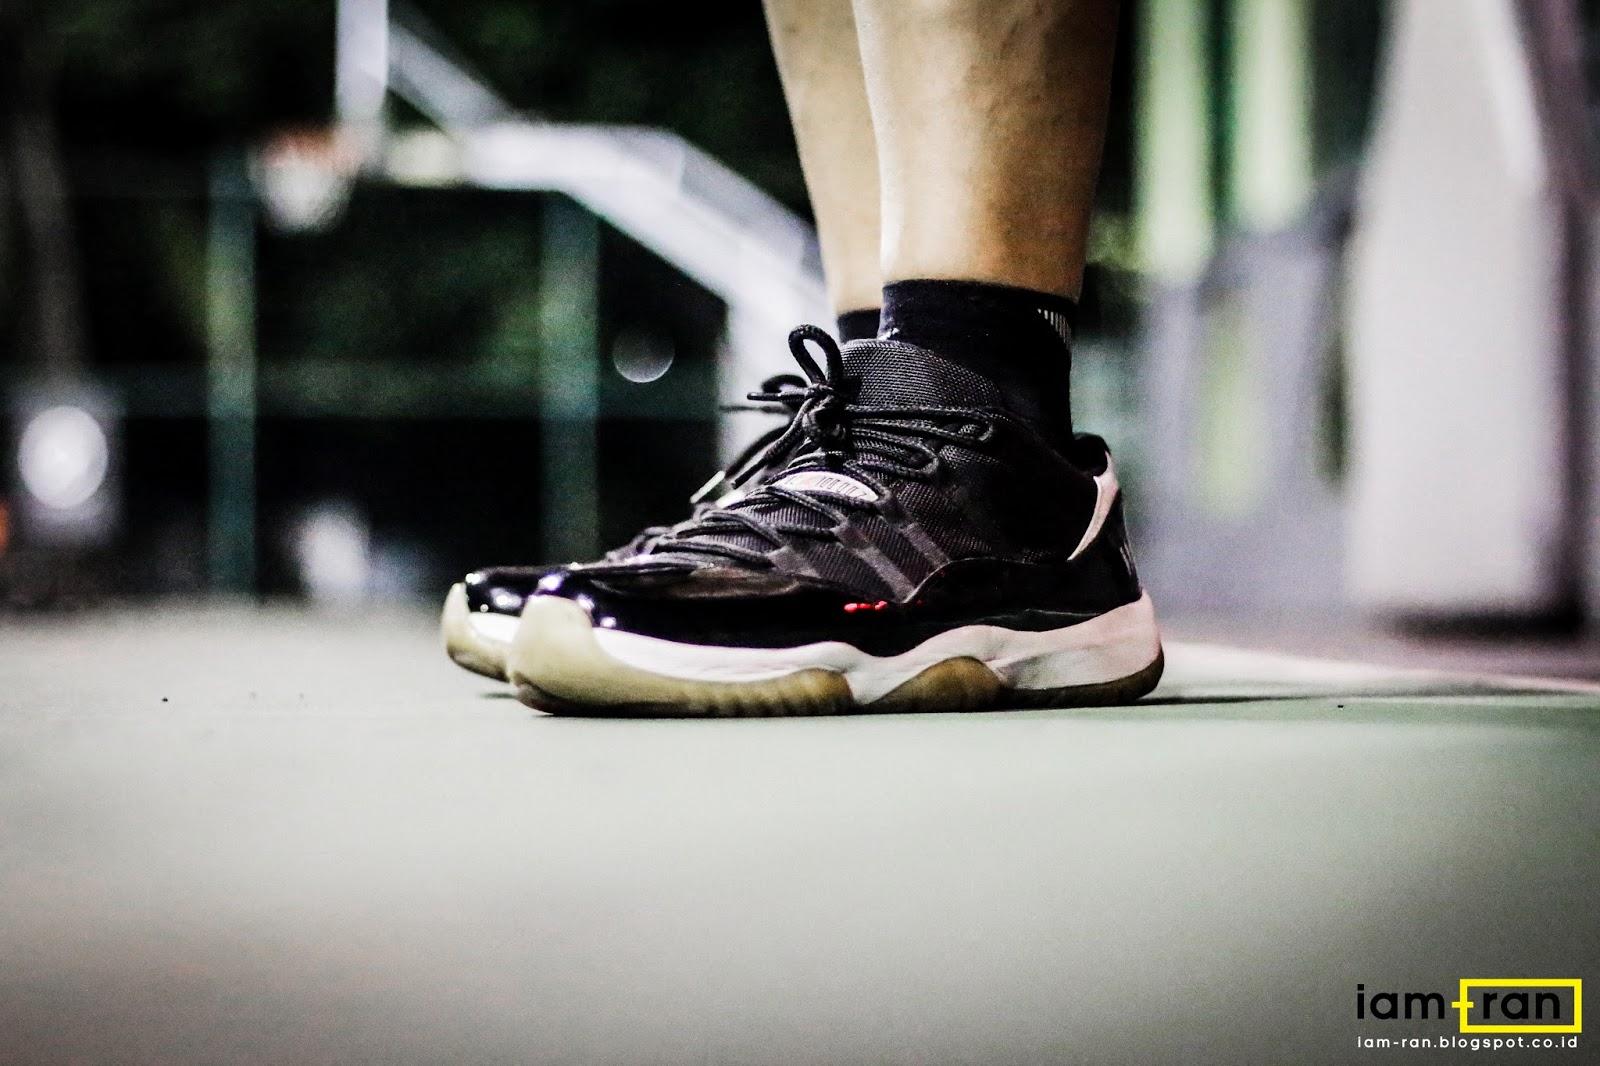 IAM-RAN  ON FEET   Arfan Okky - Nike Air Jordan 11 Low